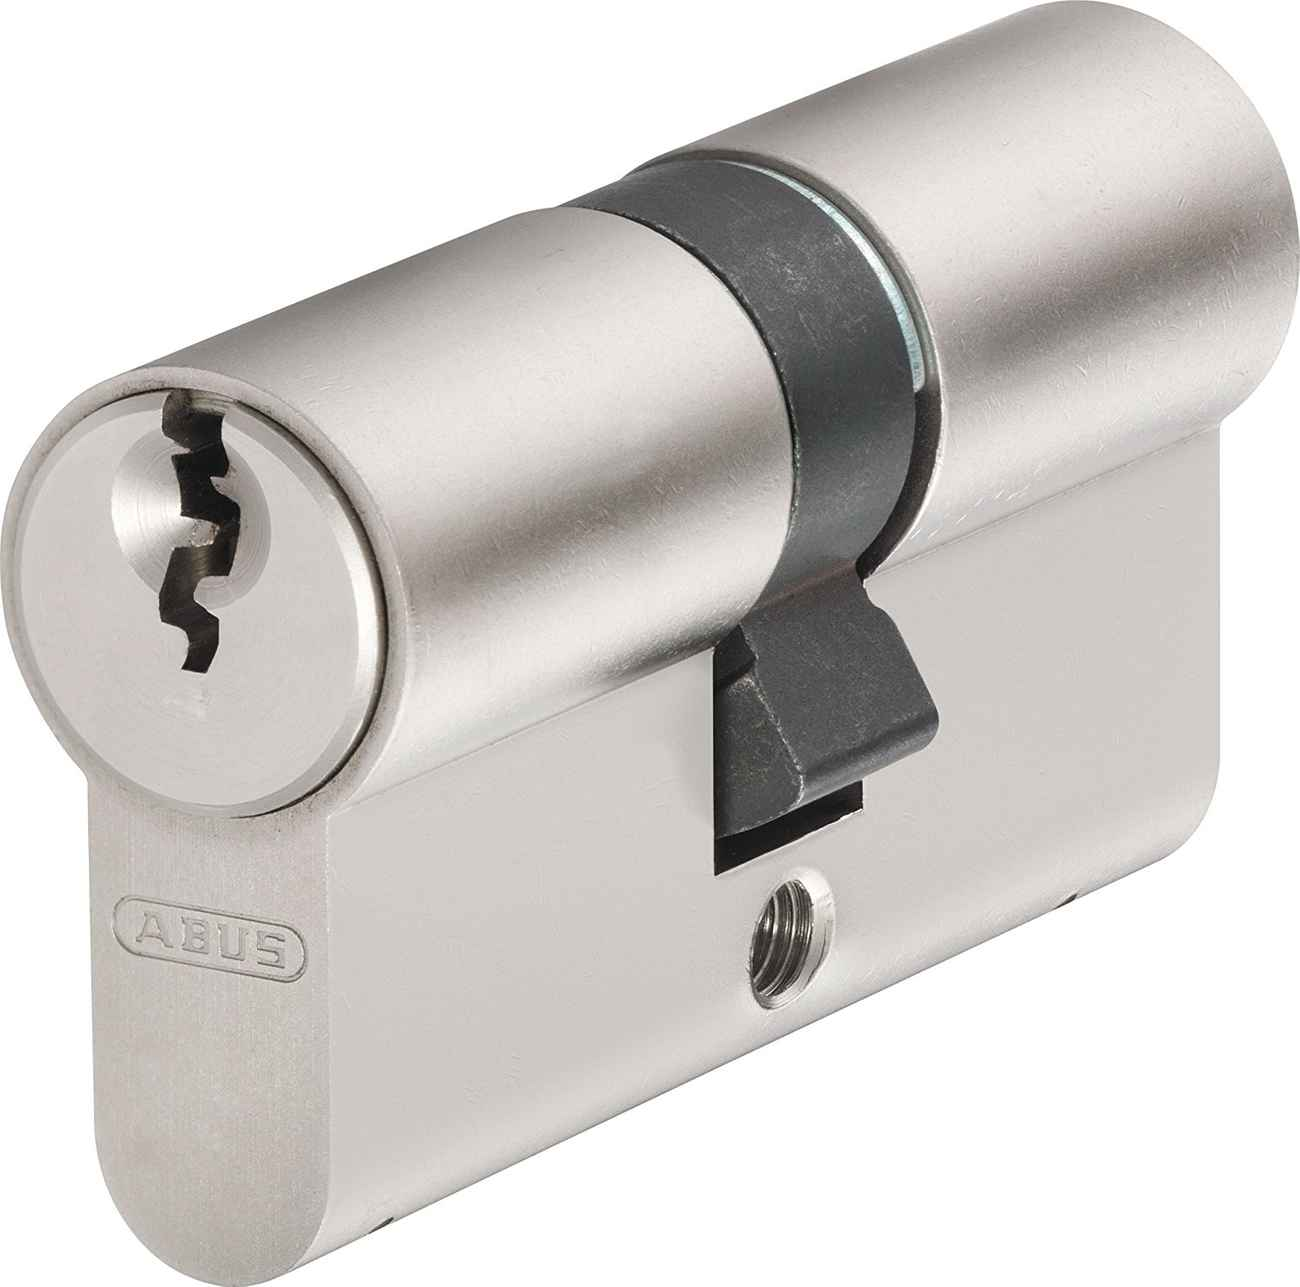 Abus Profilzylinder D6X 40/45 mm, 5 Schlüssel, Codekarte – Bild 1